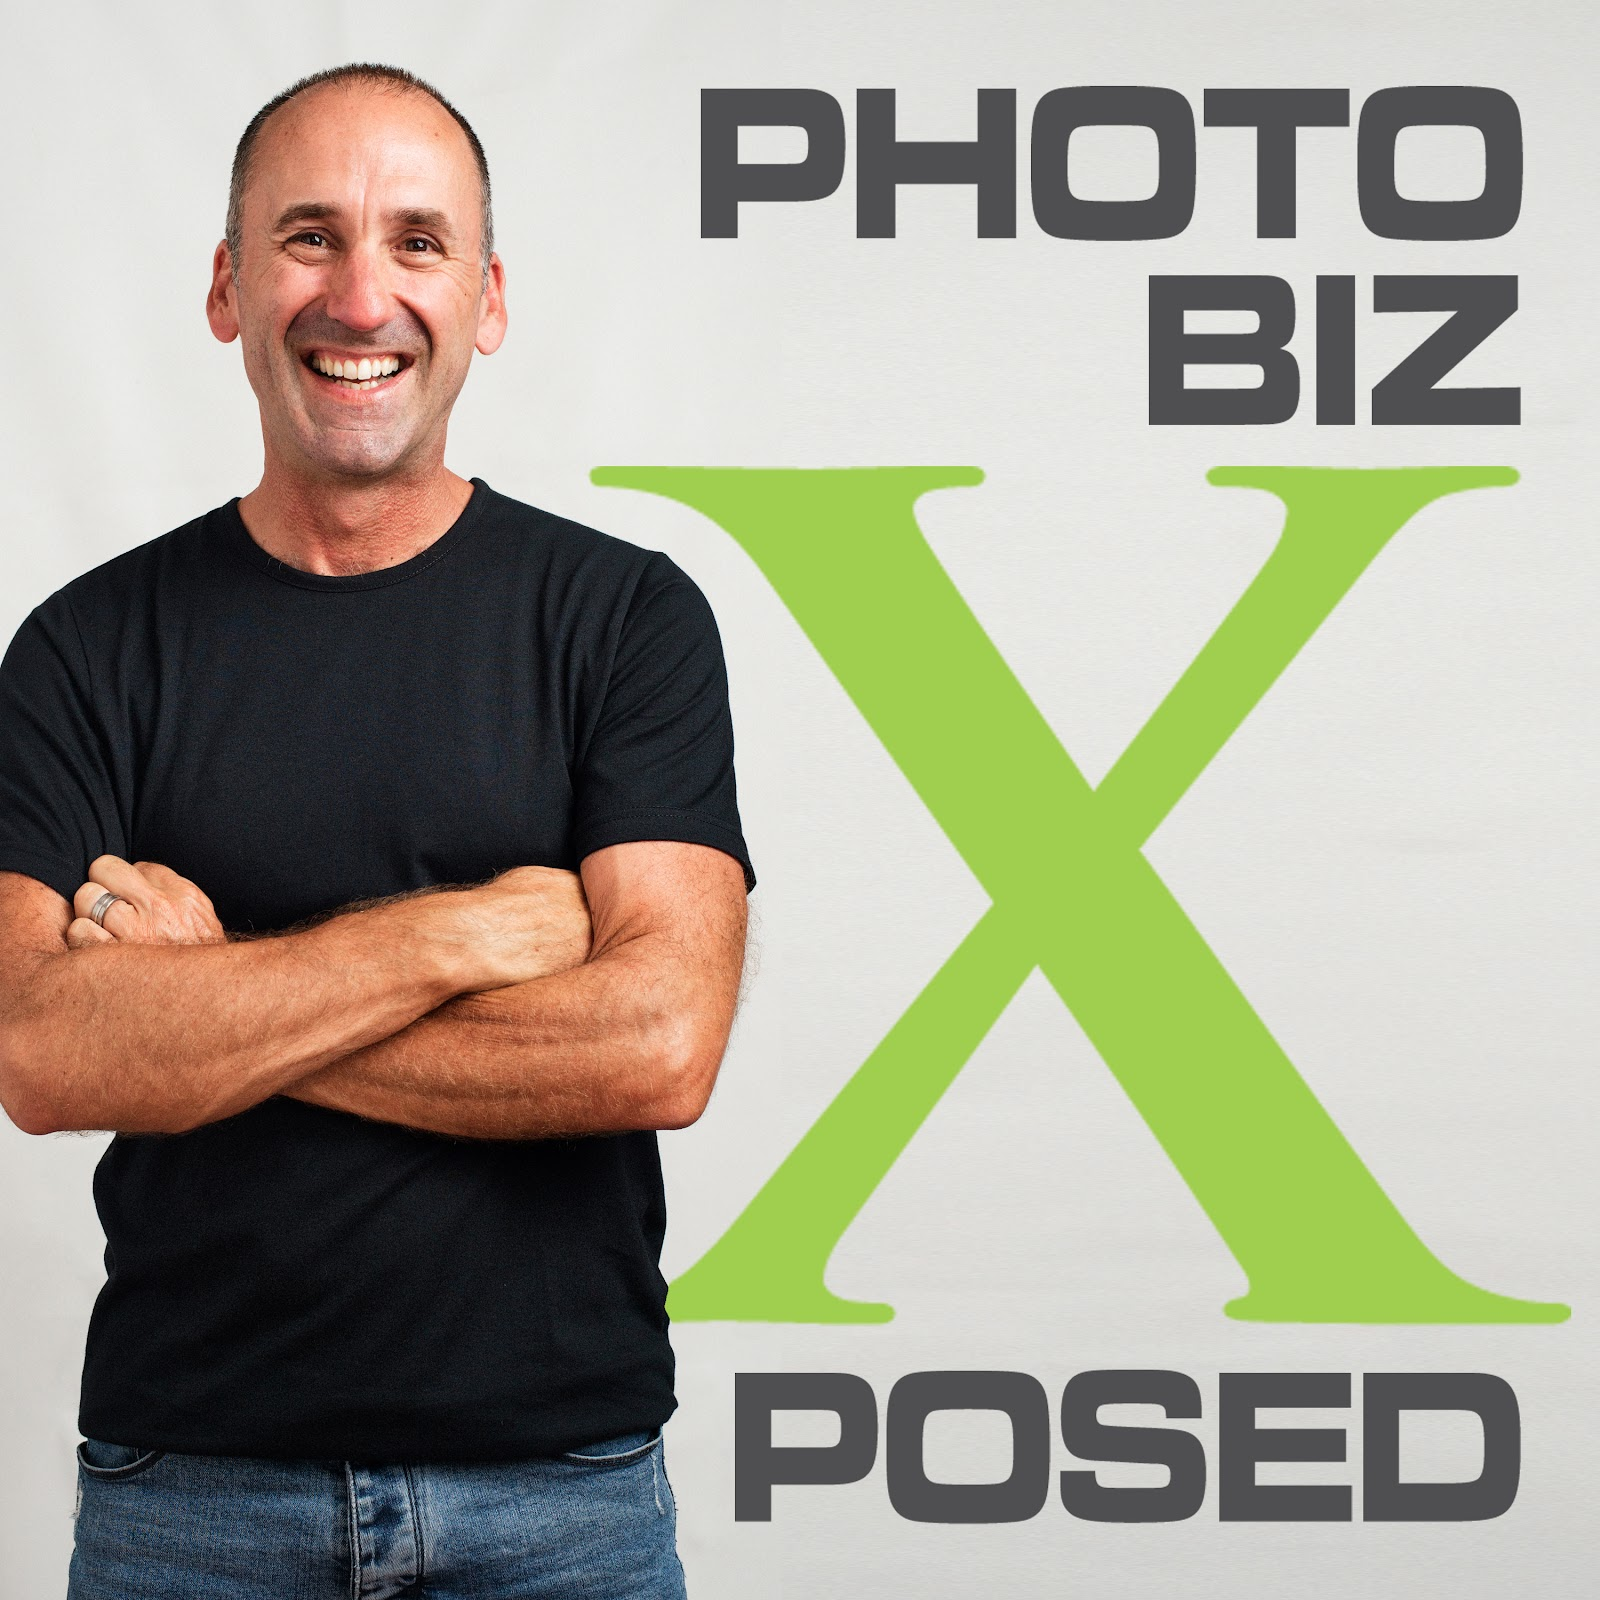 PhotoBizX The Ultimate Portrait and Wedding Photography Business Podcast - Business Podcast | Podchaser